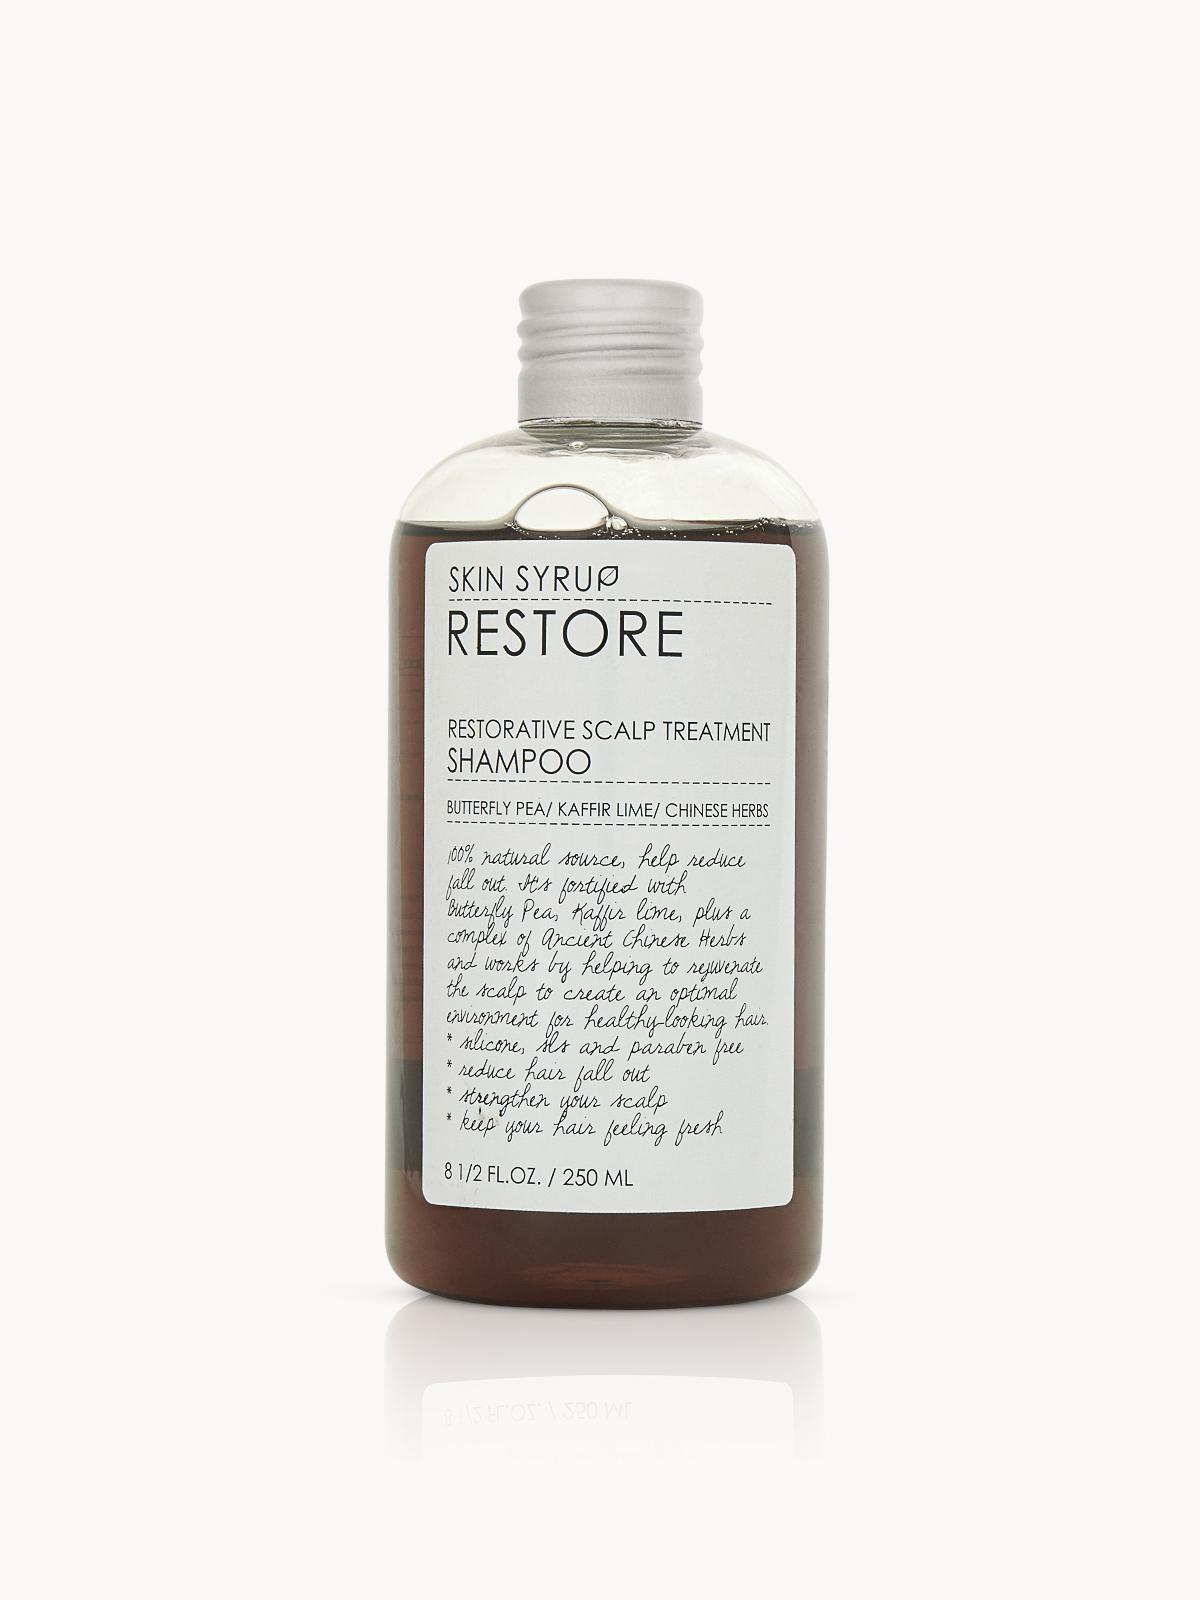 Skin Syrup Restorative Scalp Treatment Shampoo